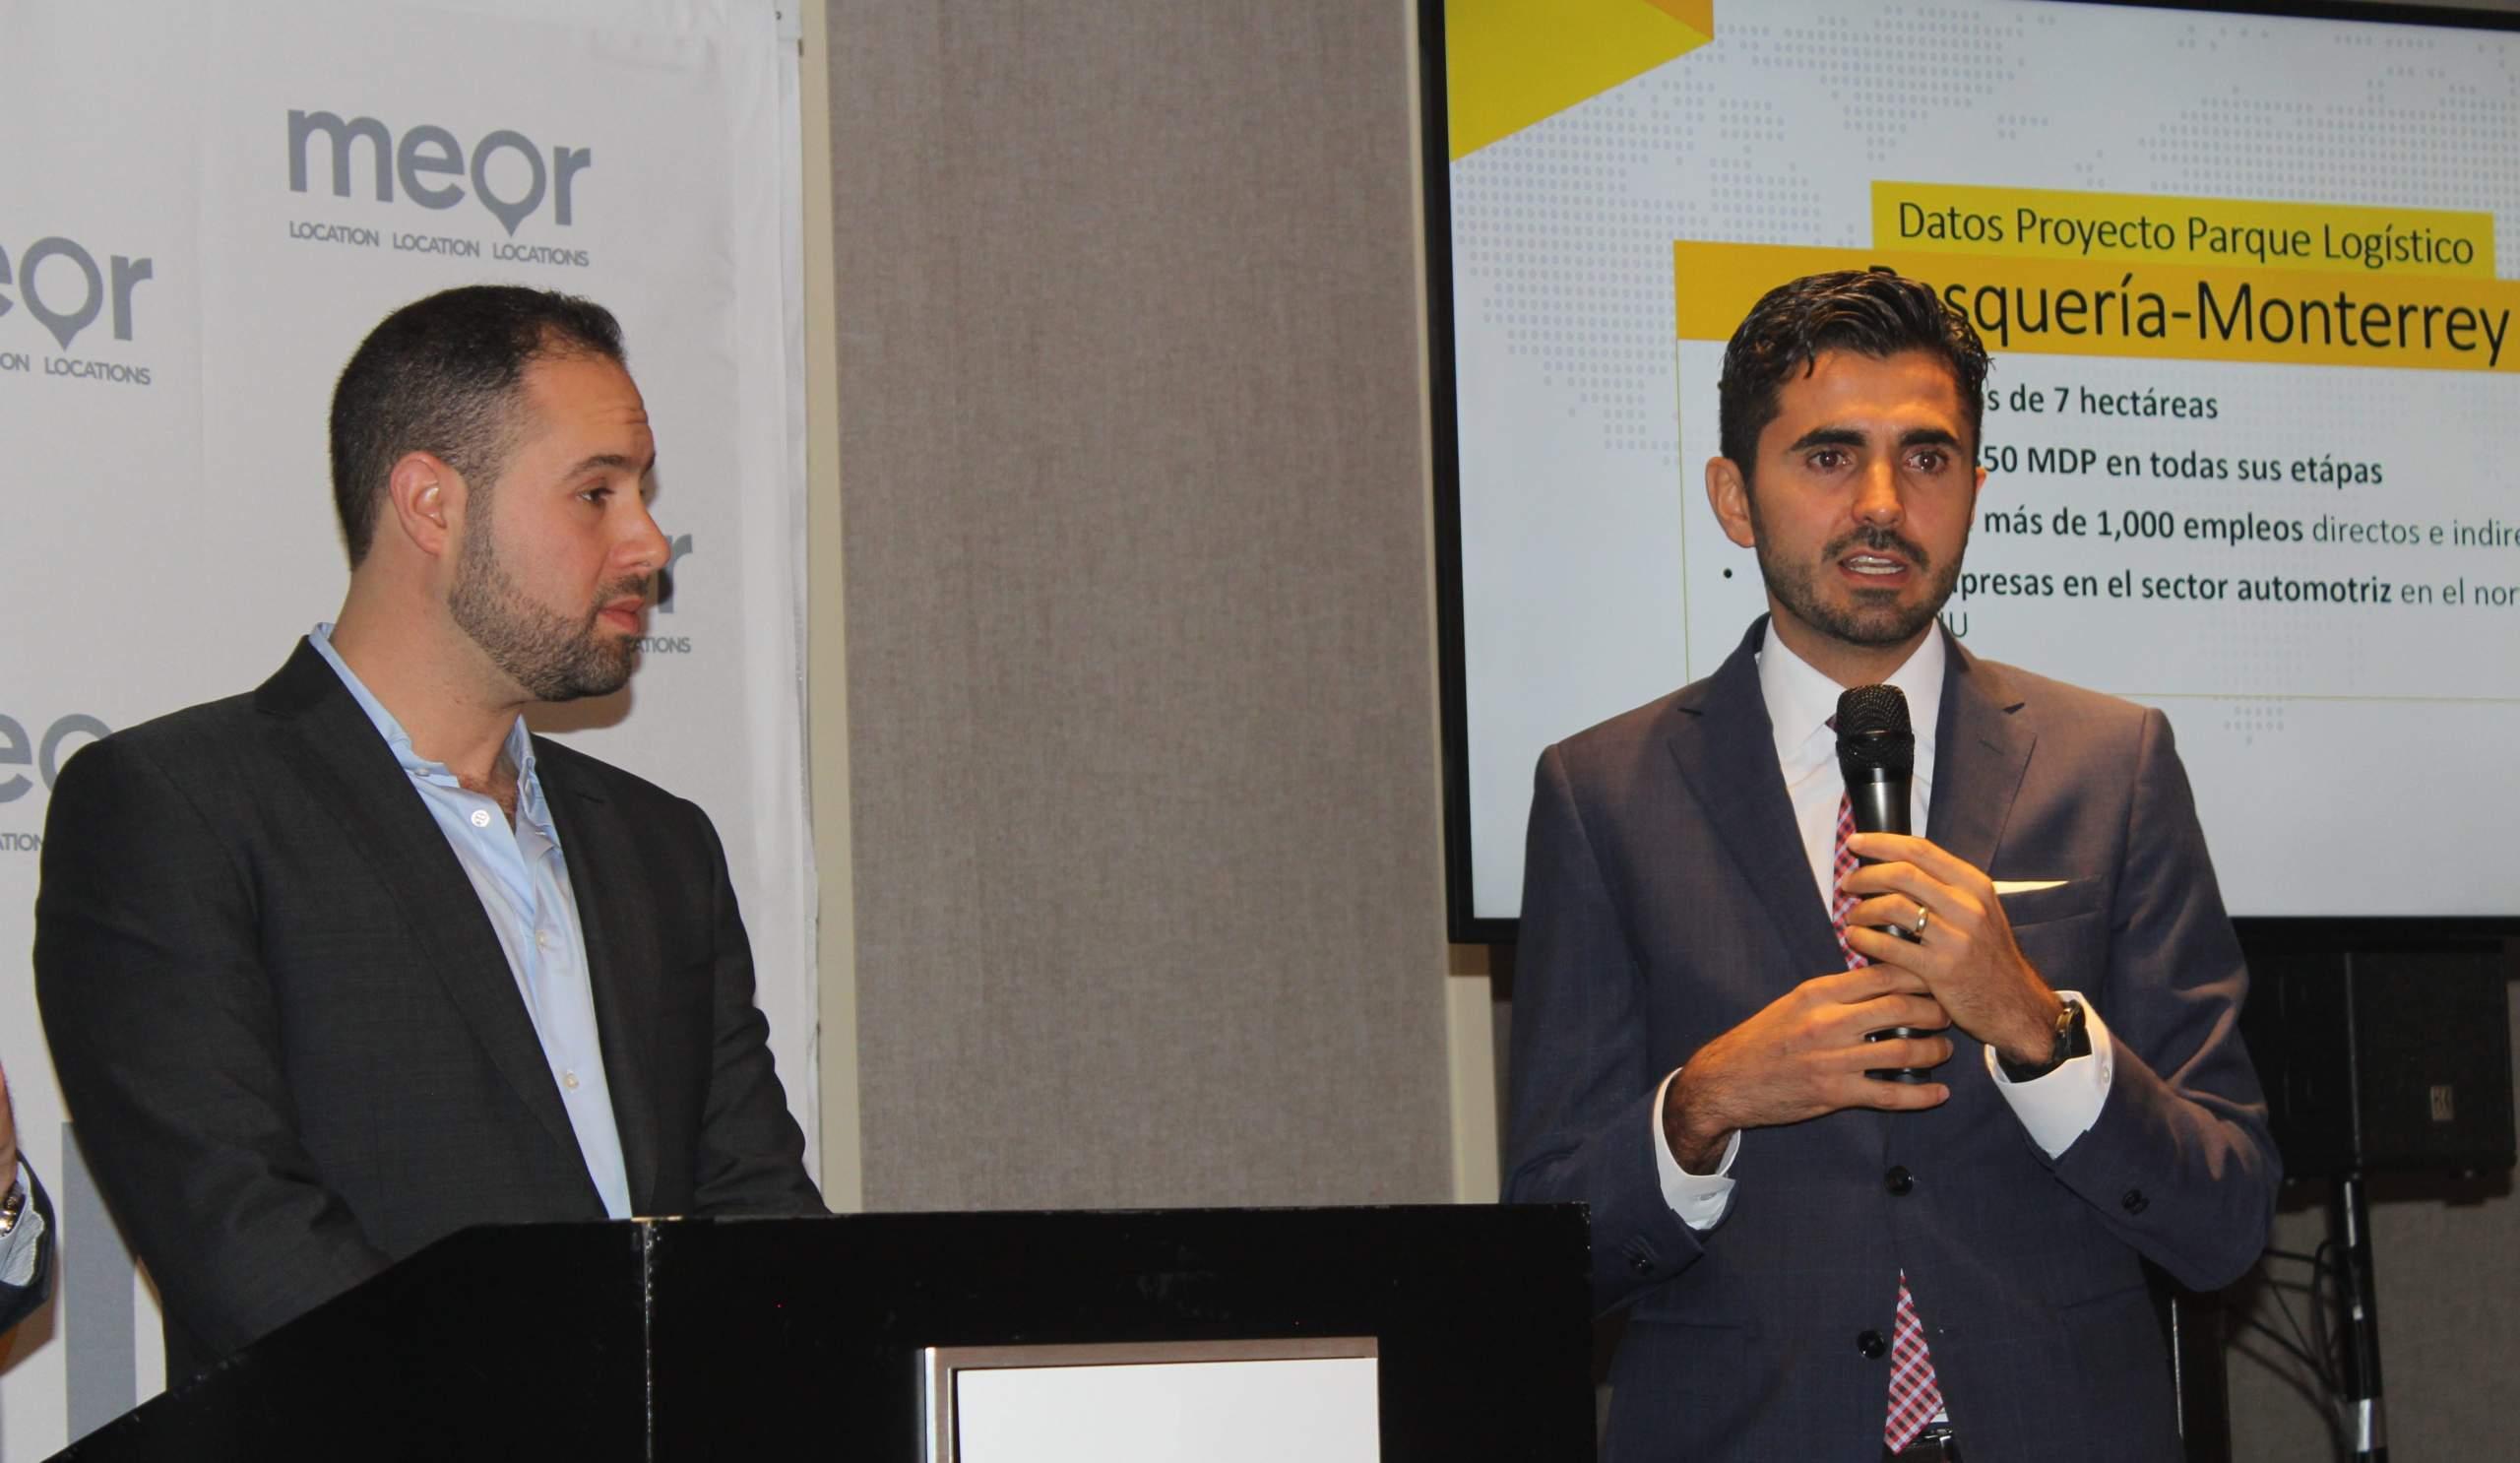 Meor invests US$18 million in Nuevo Leon